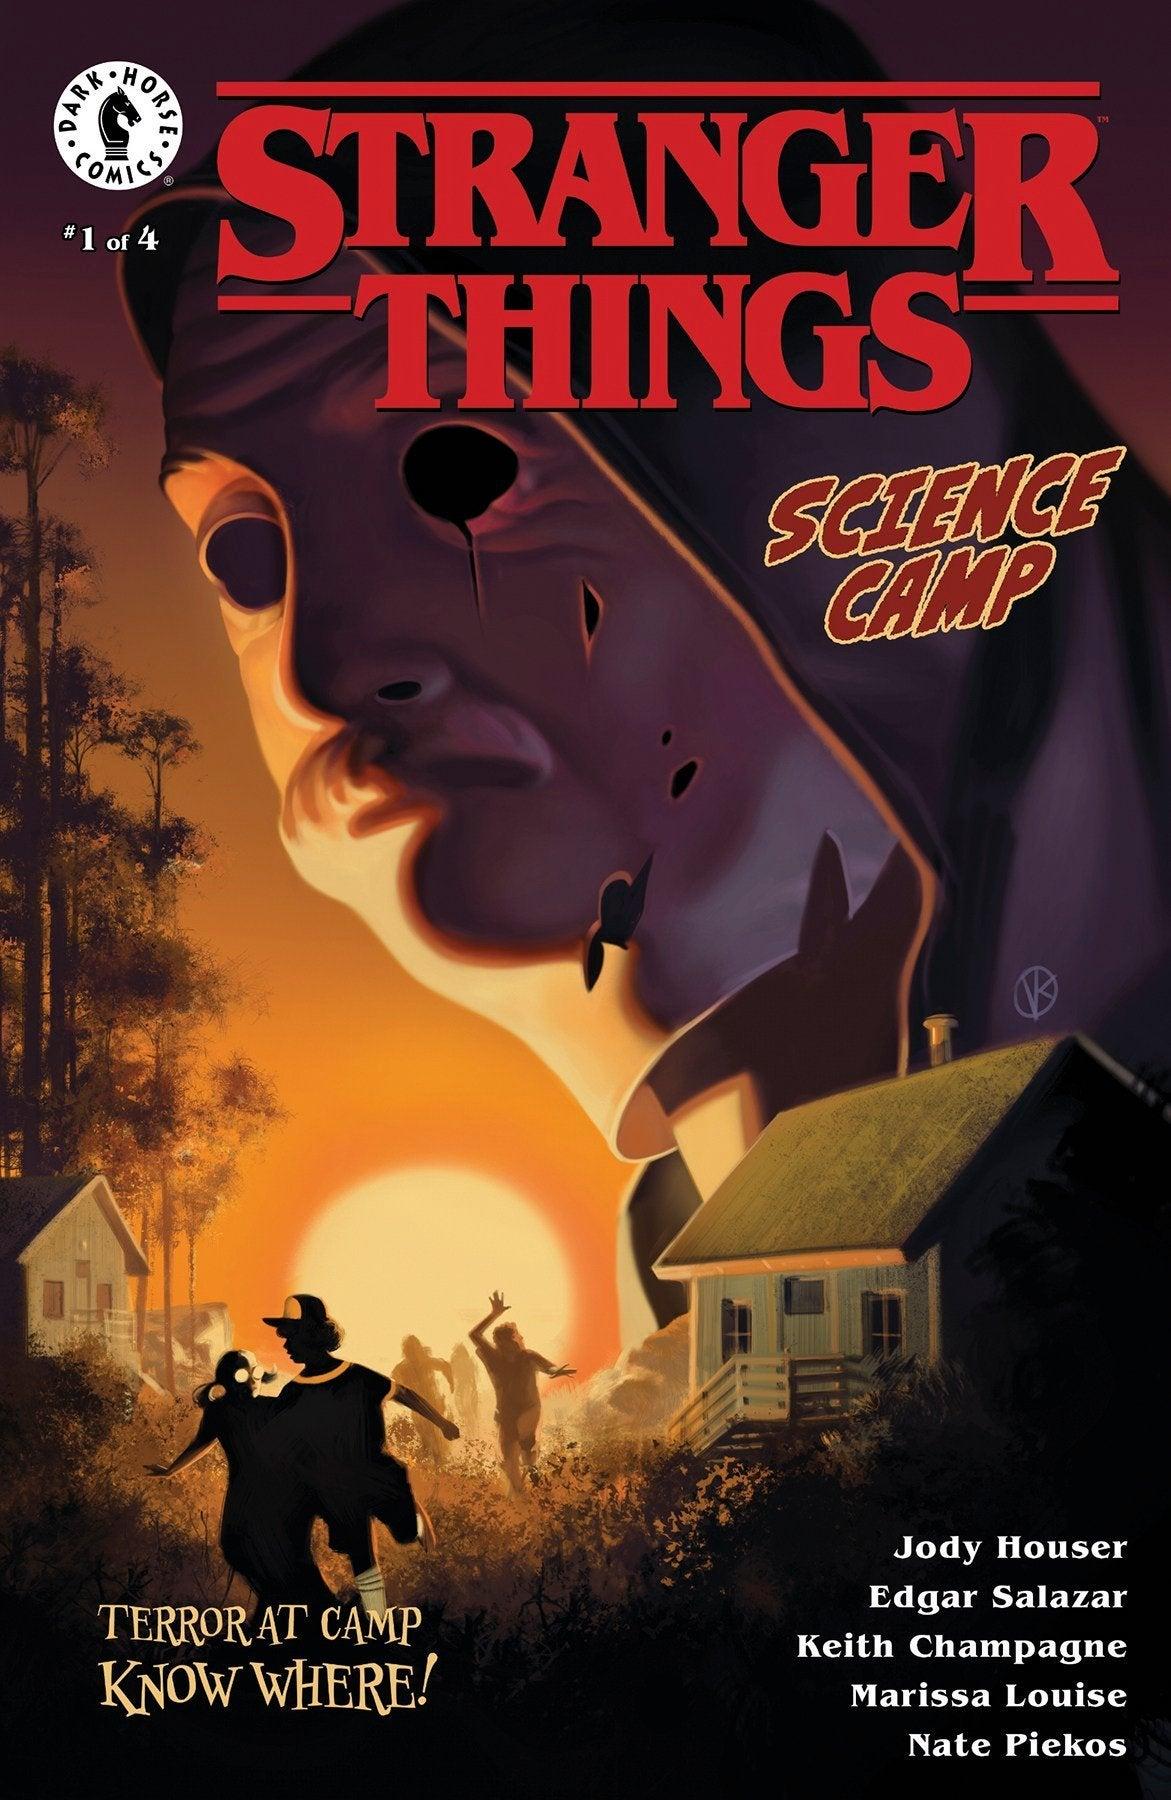 stranger things science camp comic book series